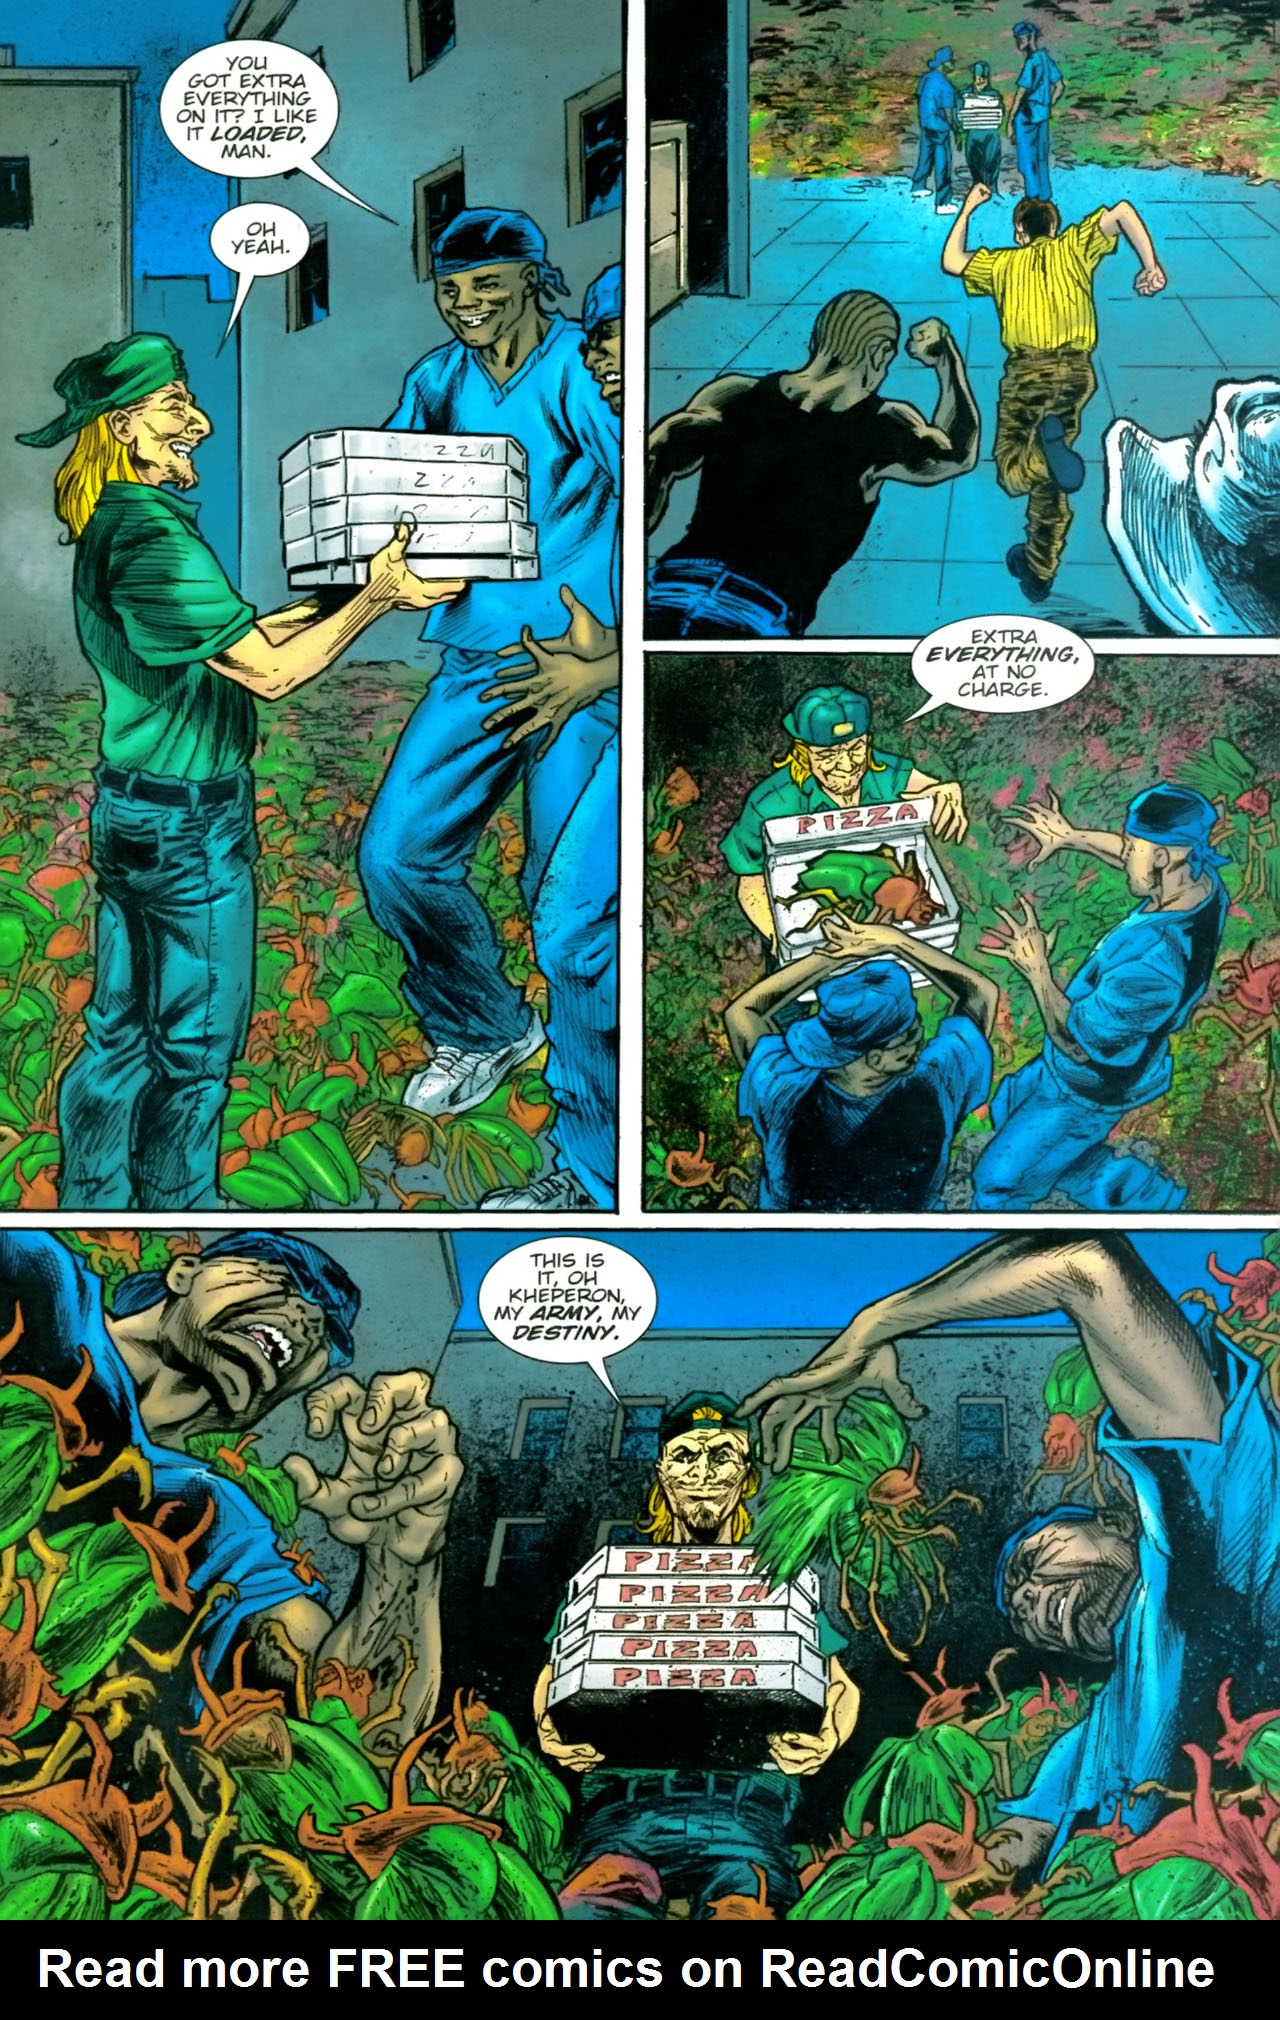 Read online The Exterminators comic -  Issue #22 - 21